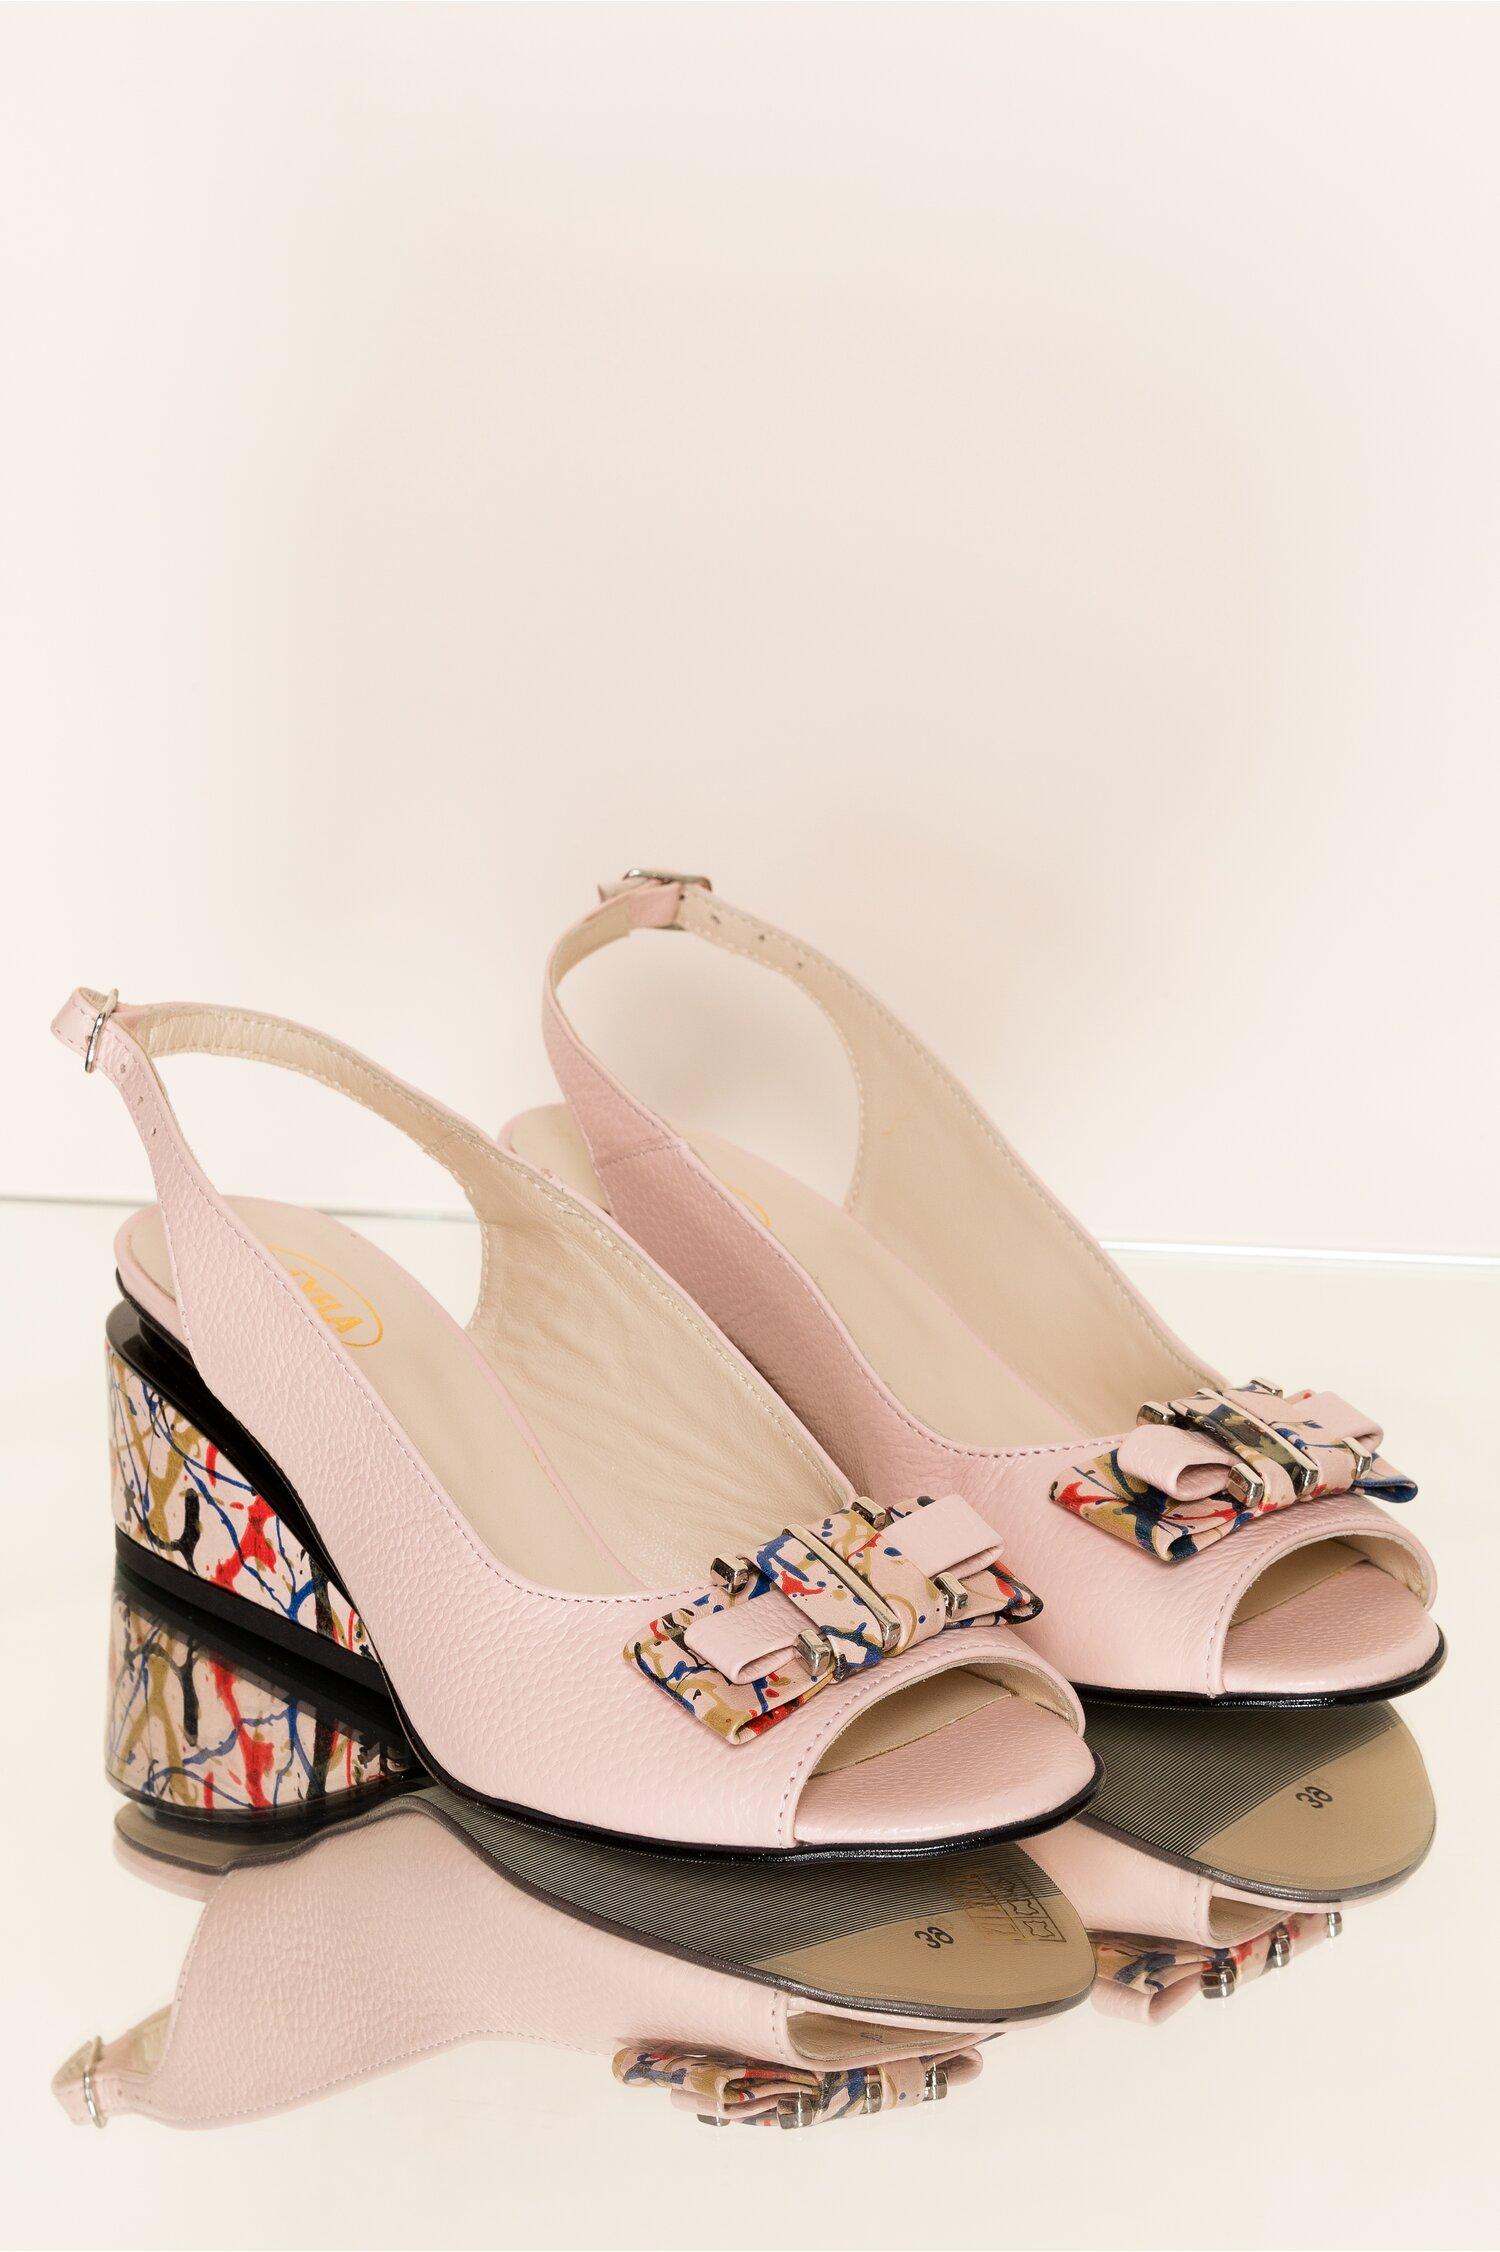 Sandale Jessy roz pal cu decupaj la calcai si imprimeu paint